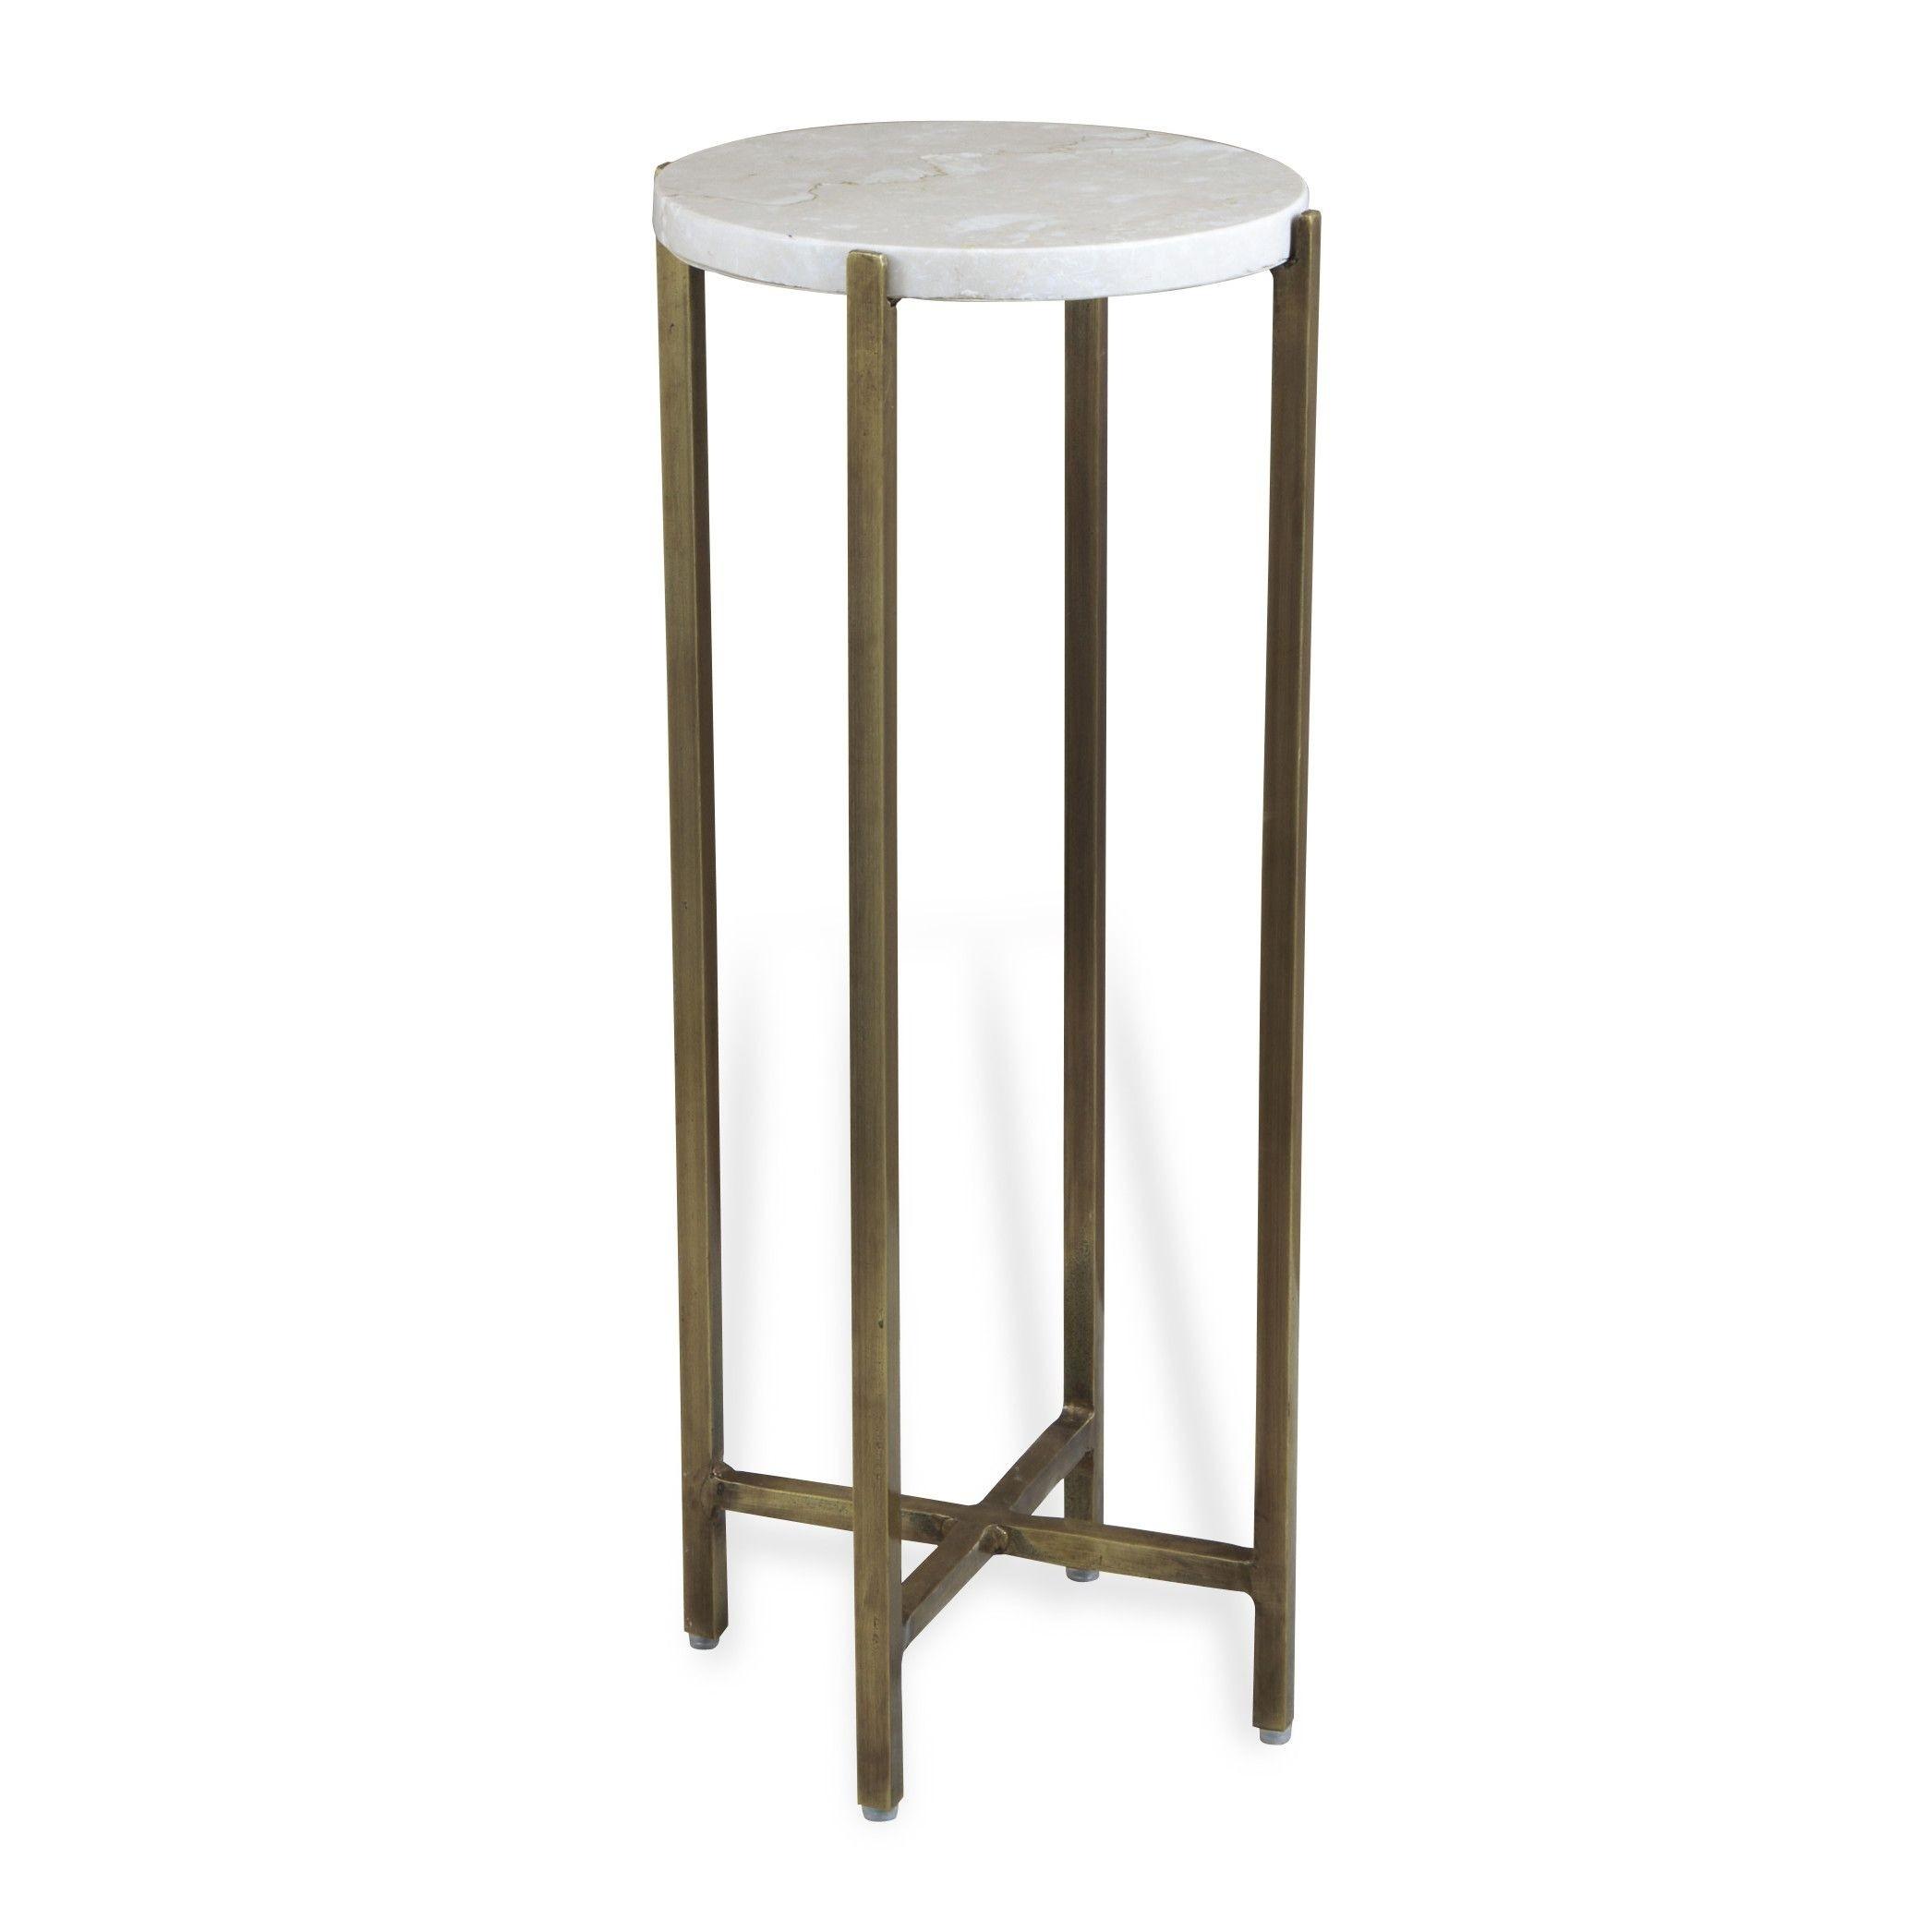 Zahara Round Ivory Marble Side Table